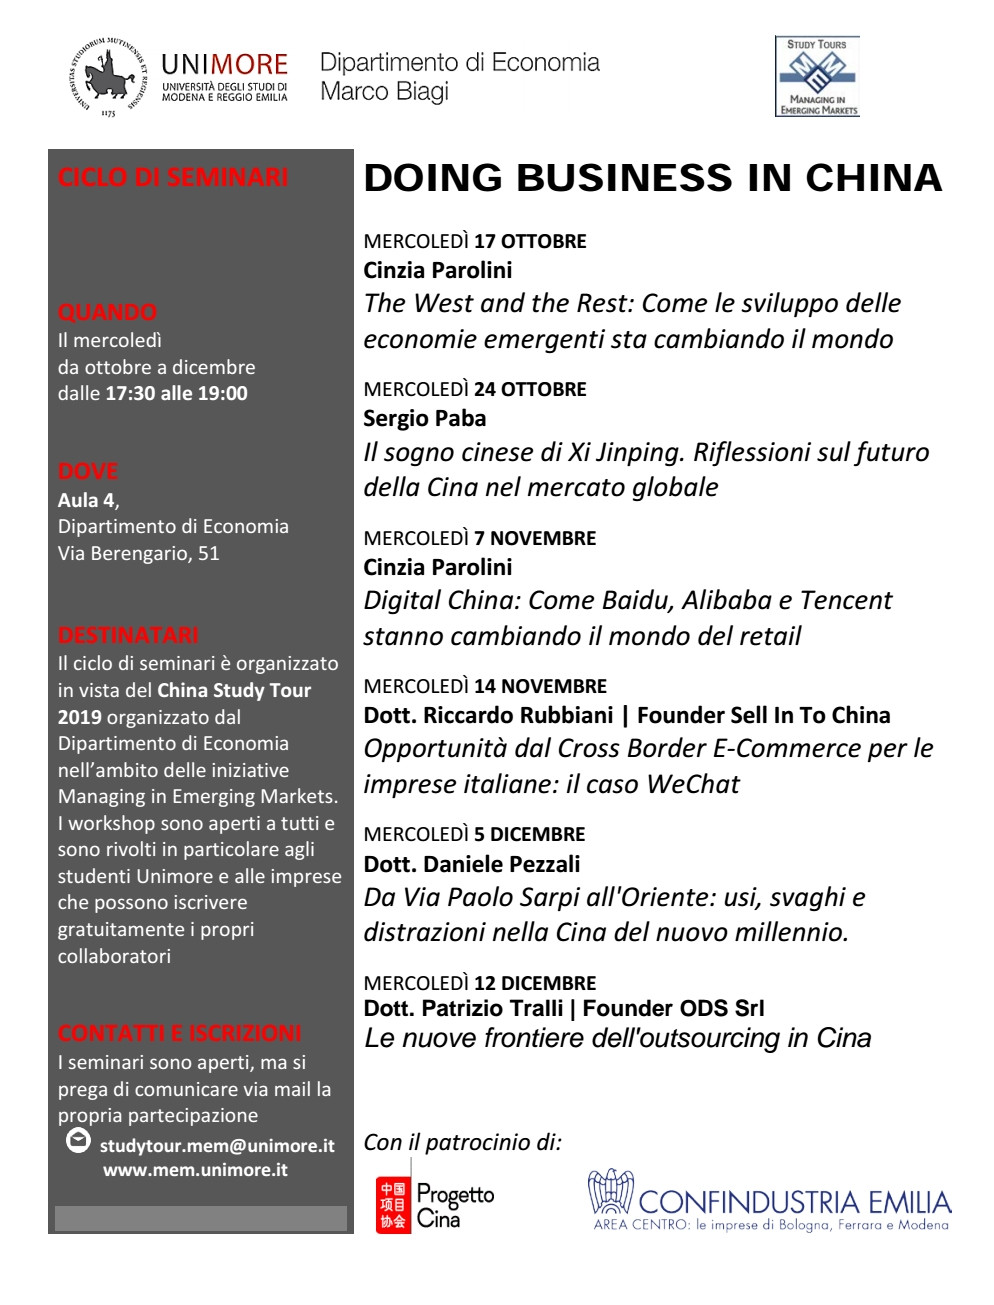 Programma Doing Business in China Modena